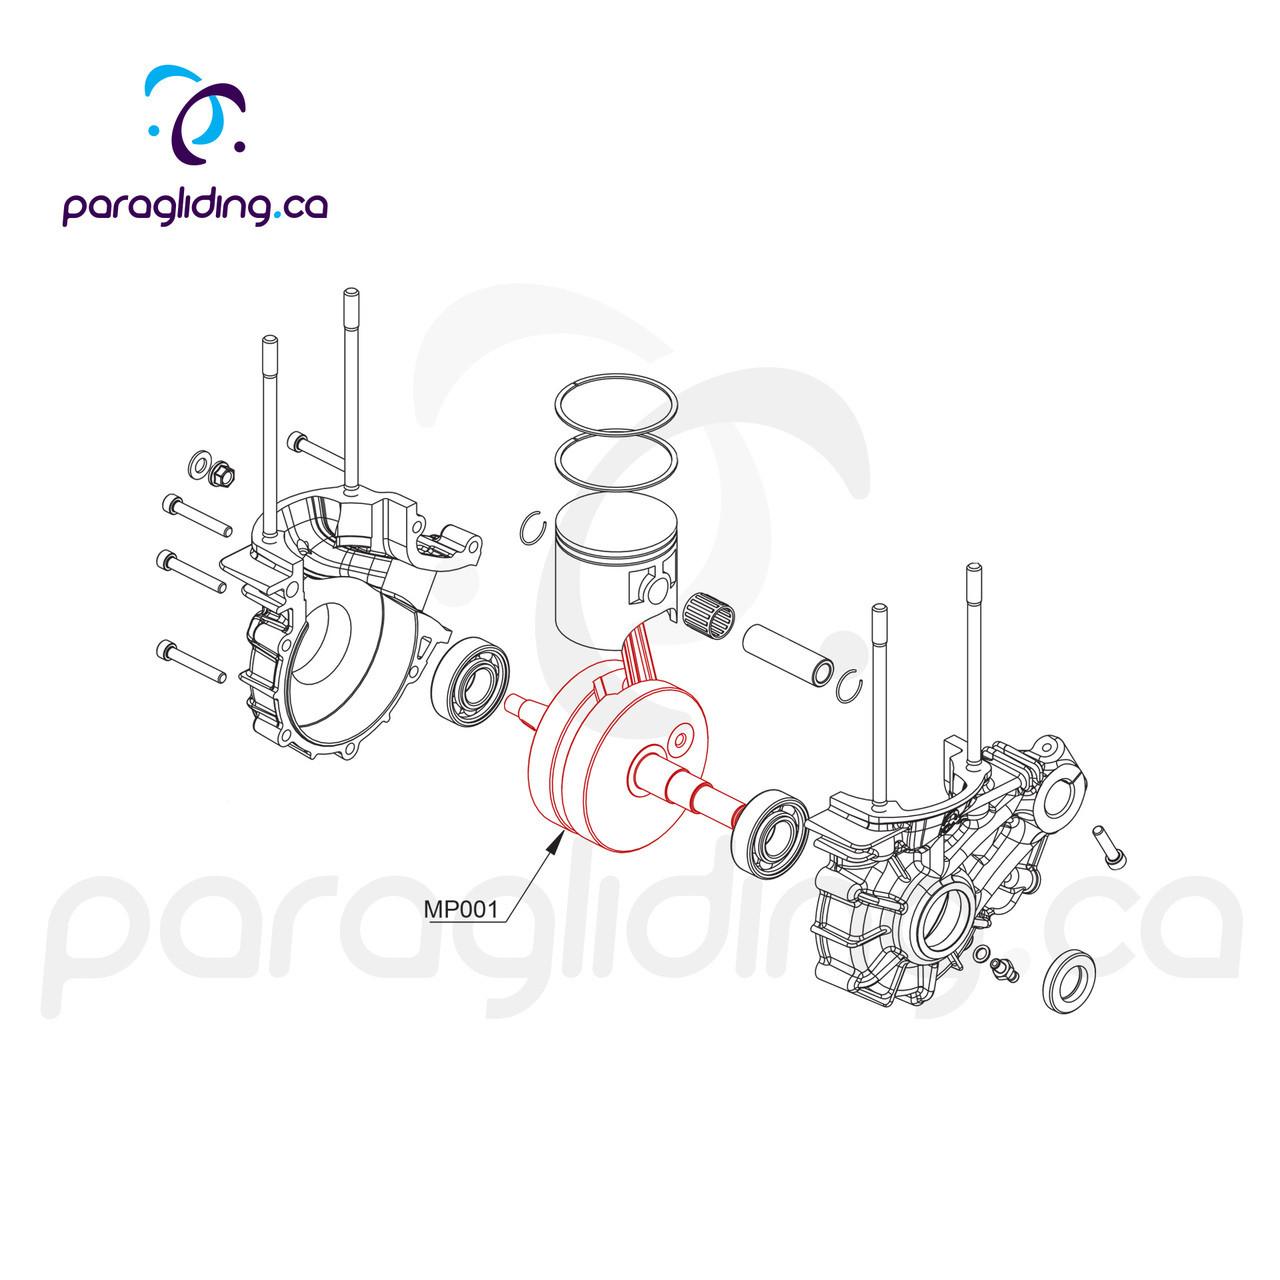 Crankshaft with push rod - Vittorazi Moster 185 - MP001